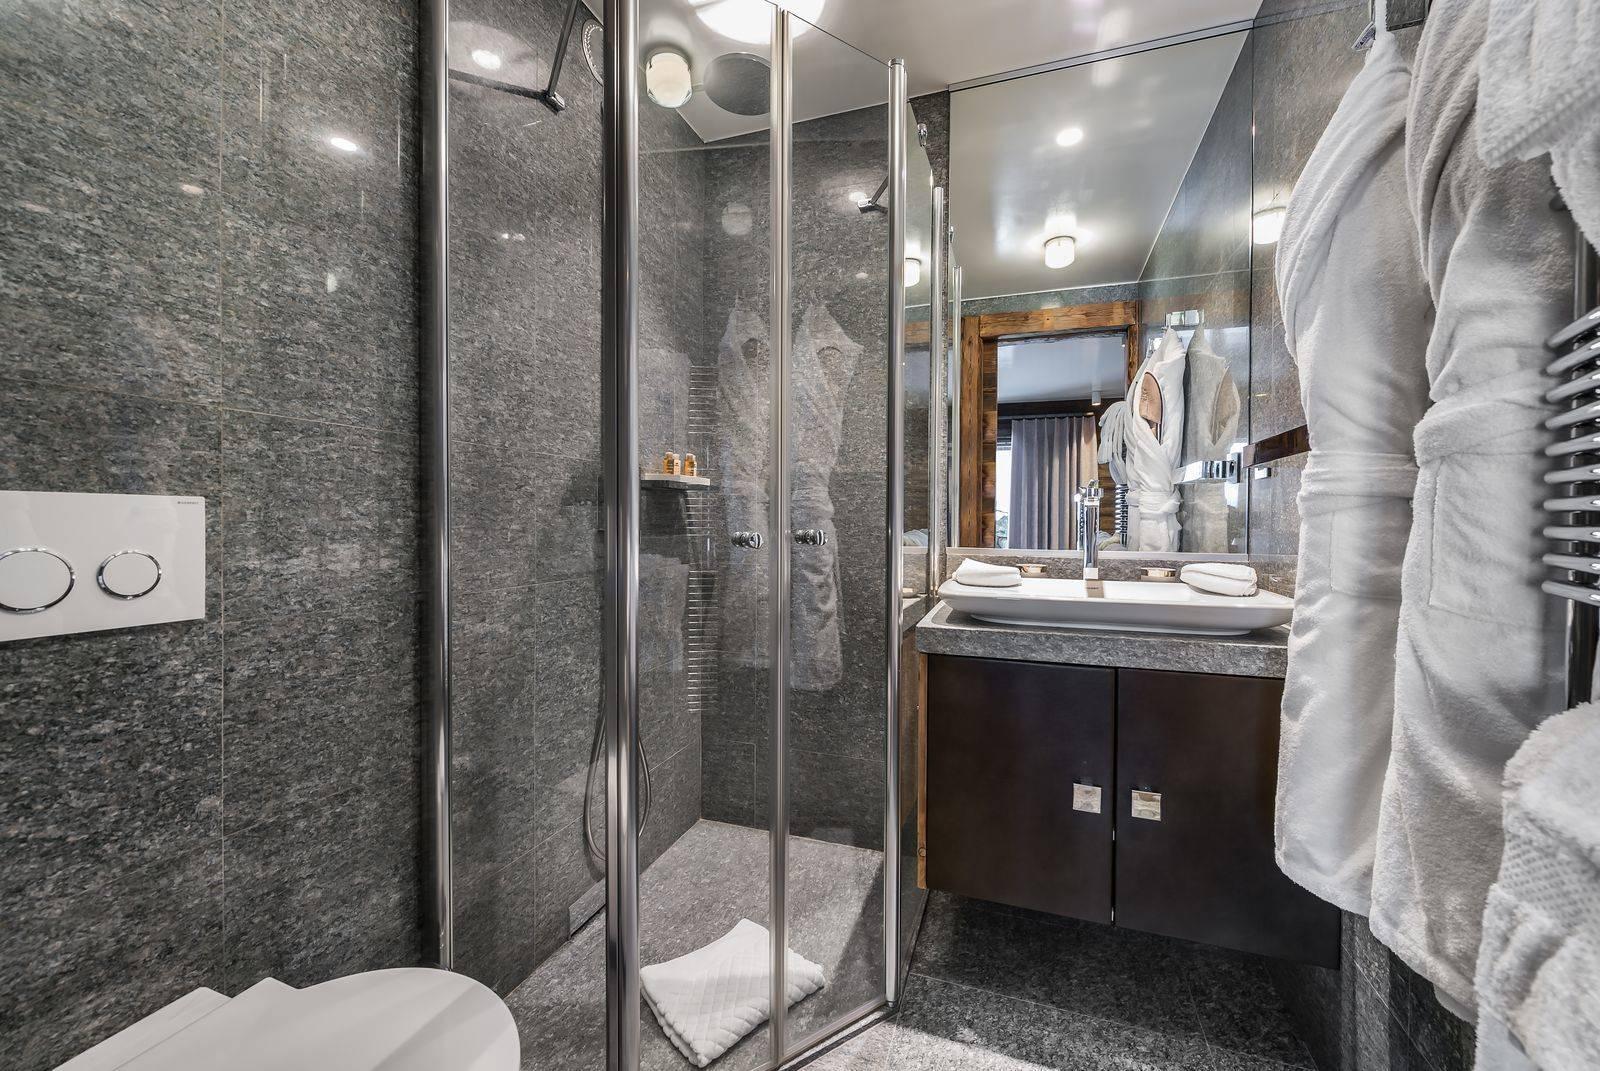 Lovelydays luxury service apartment rental - Megève - Senses Chalet - Partner - 6 bedrooms - 6 bathrooms - Lovely shower - 3f14a55d87dc - Lovelydays